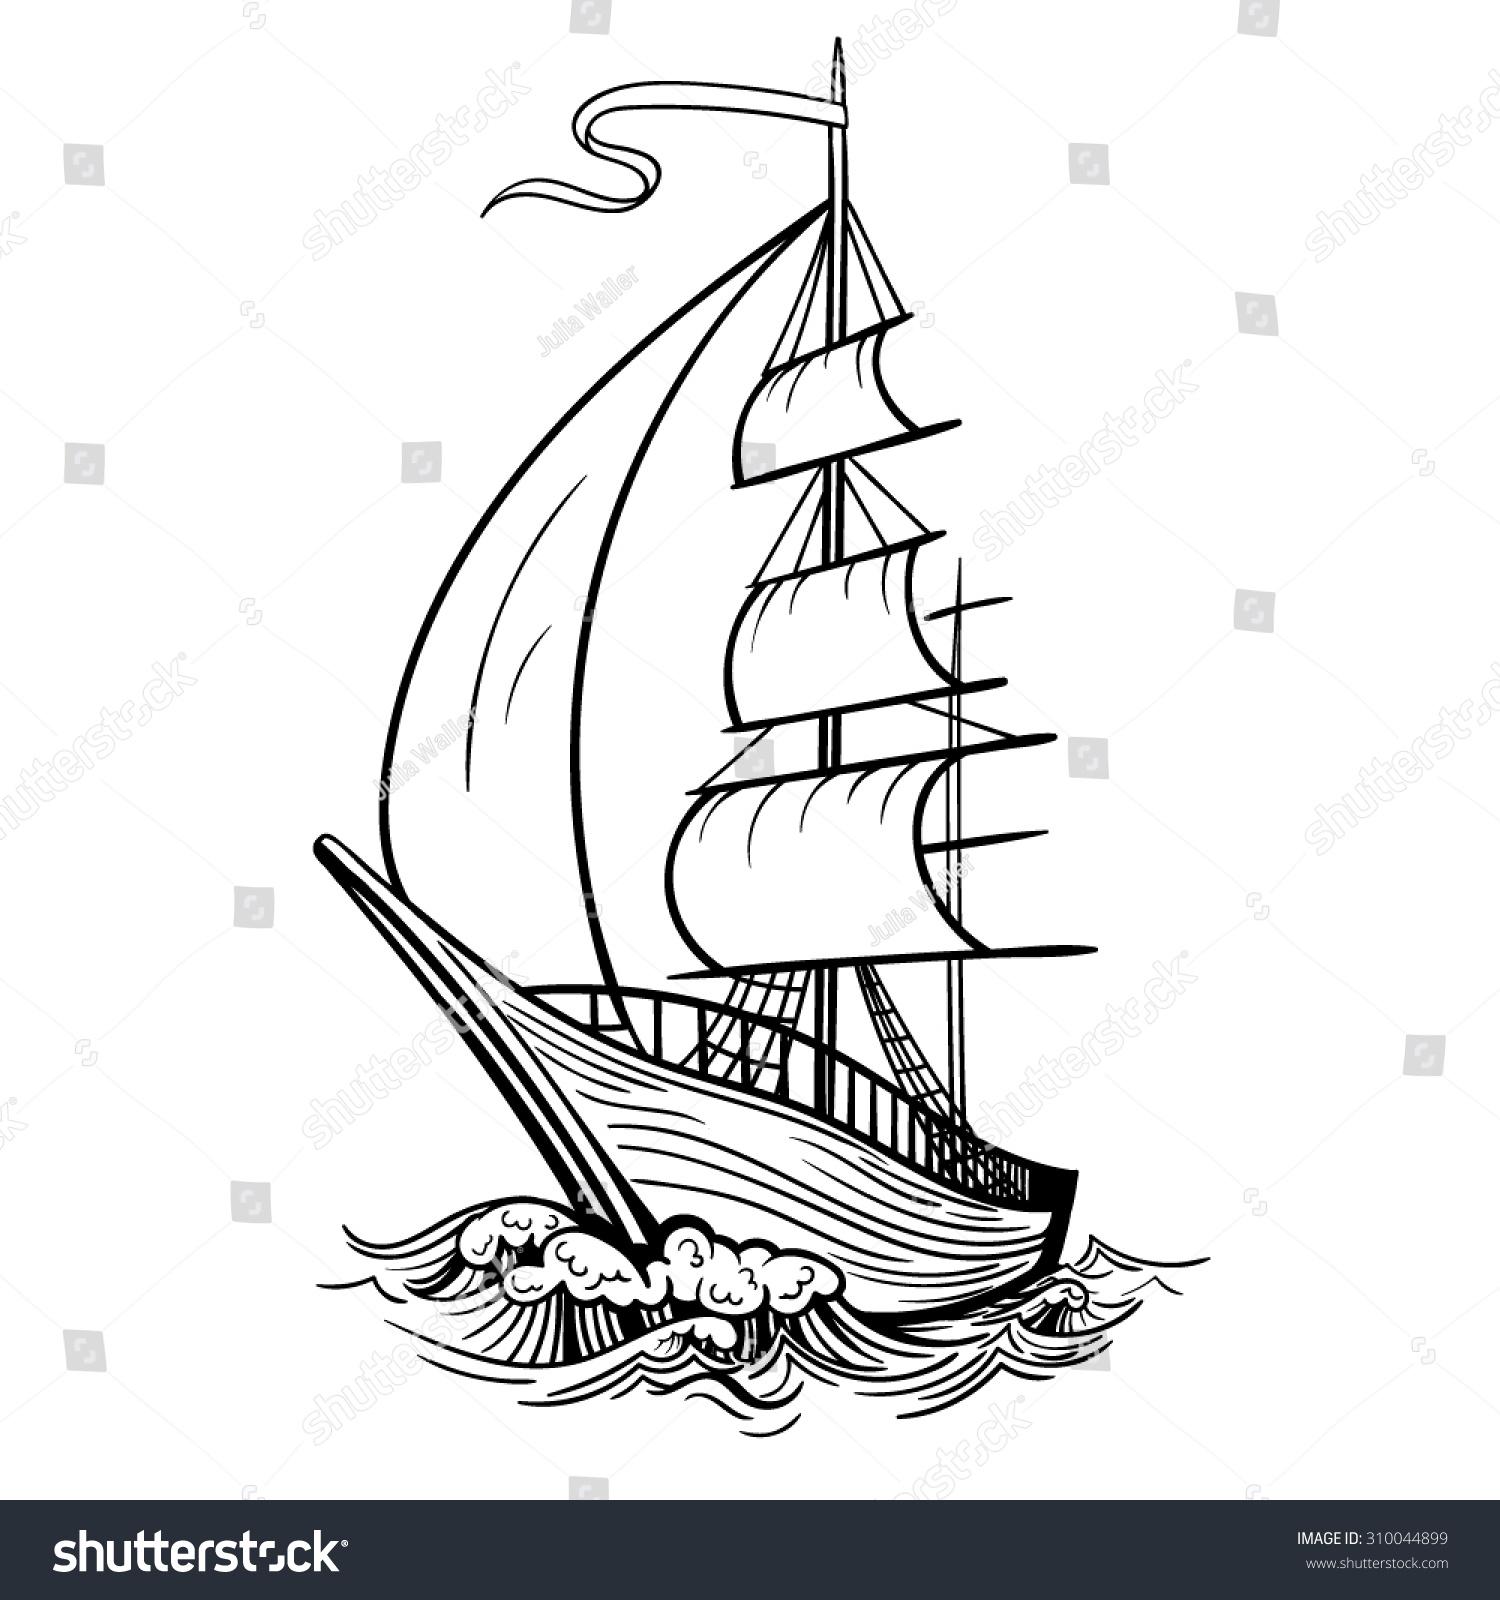 Vector Black White Tattoo Ship Stock Vector Royalty Free